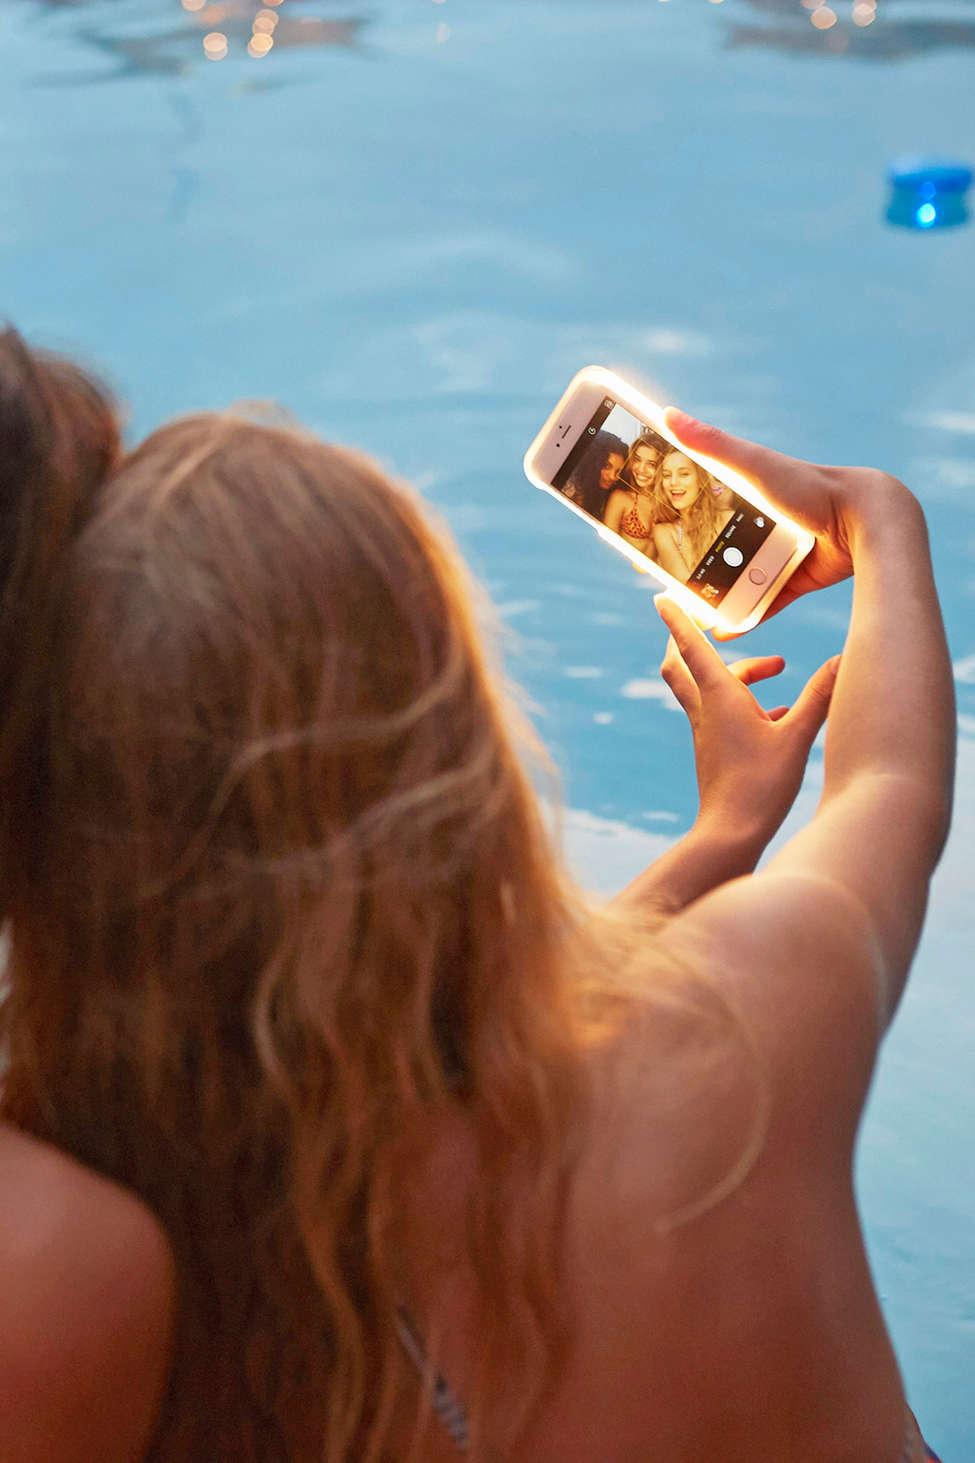 perfect selfie Iphone case